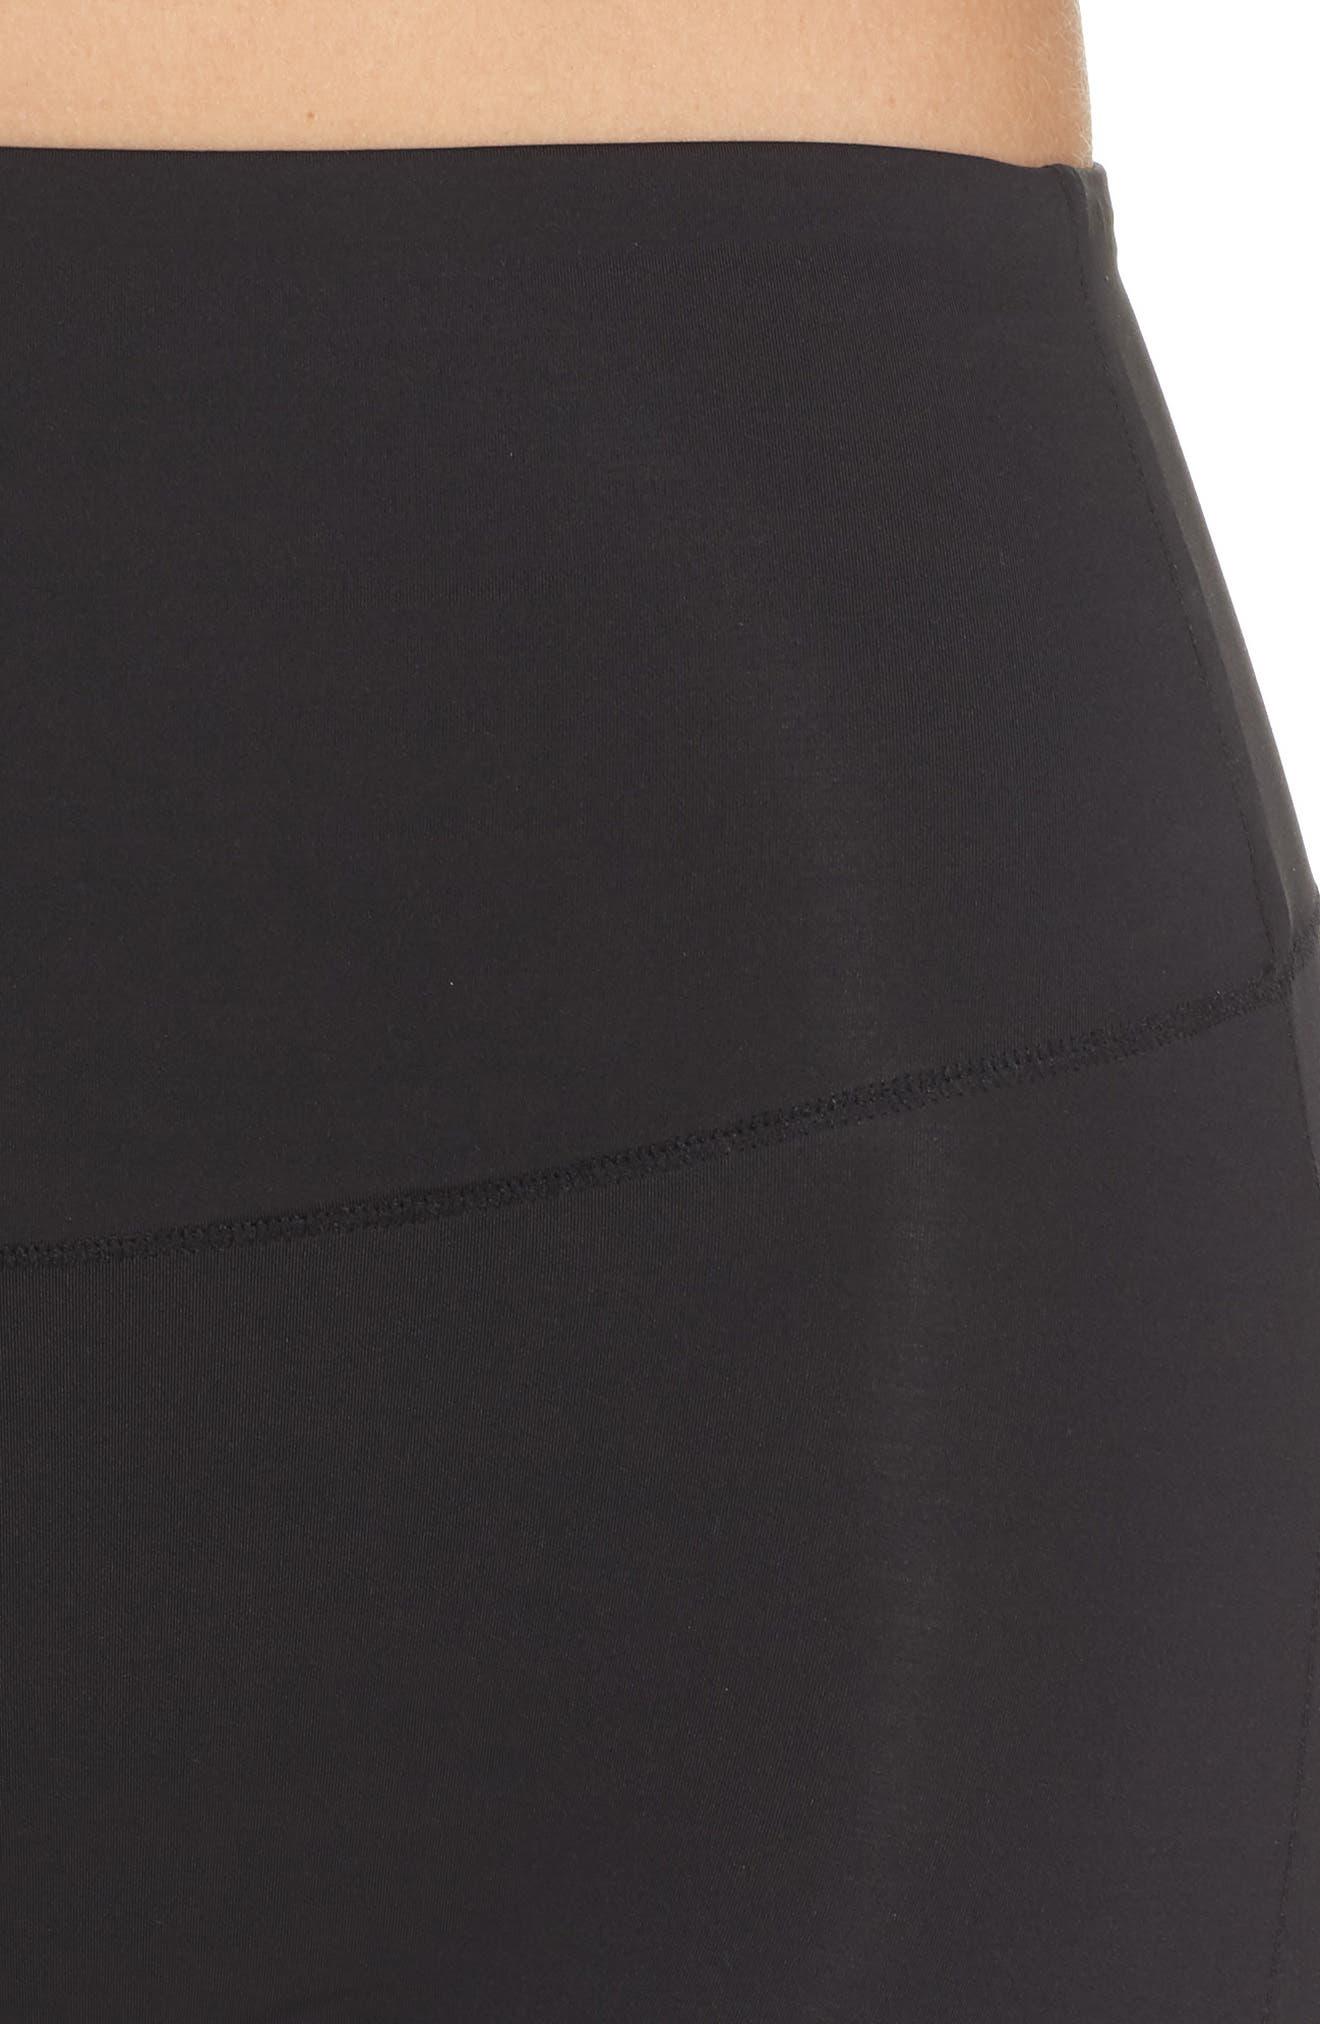 Tummie Tamers Mid Waist Shaping Shorts,                             Alternate thumbnail 4, color,                             001